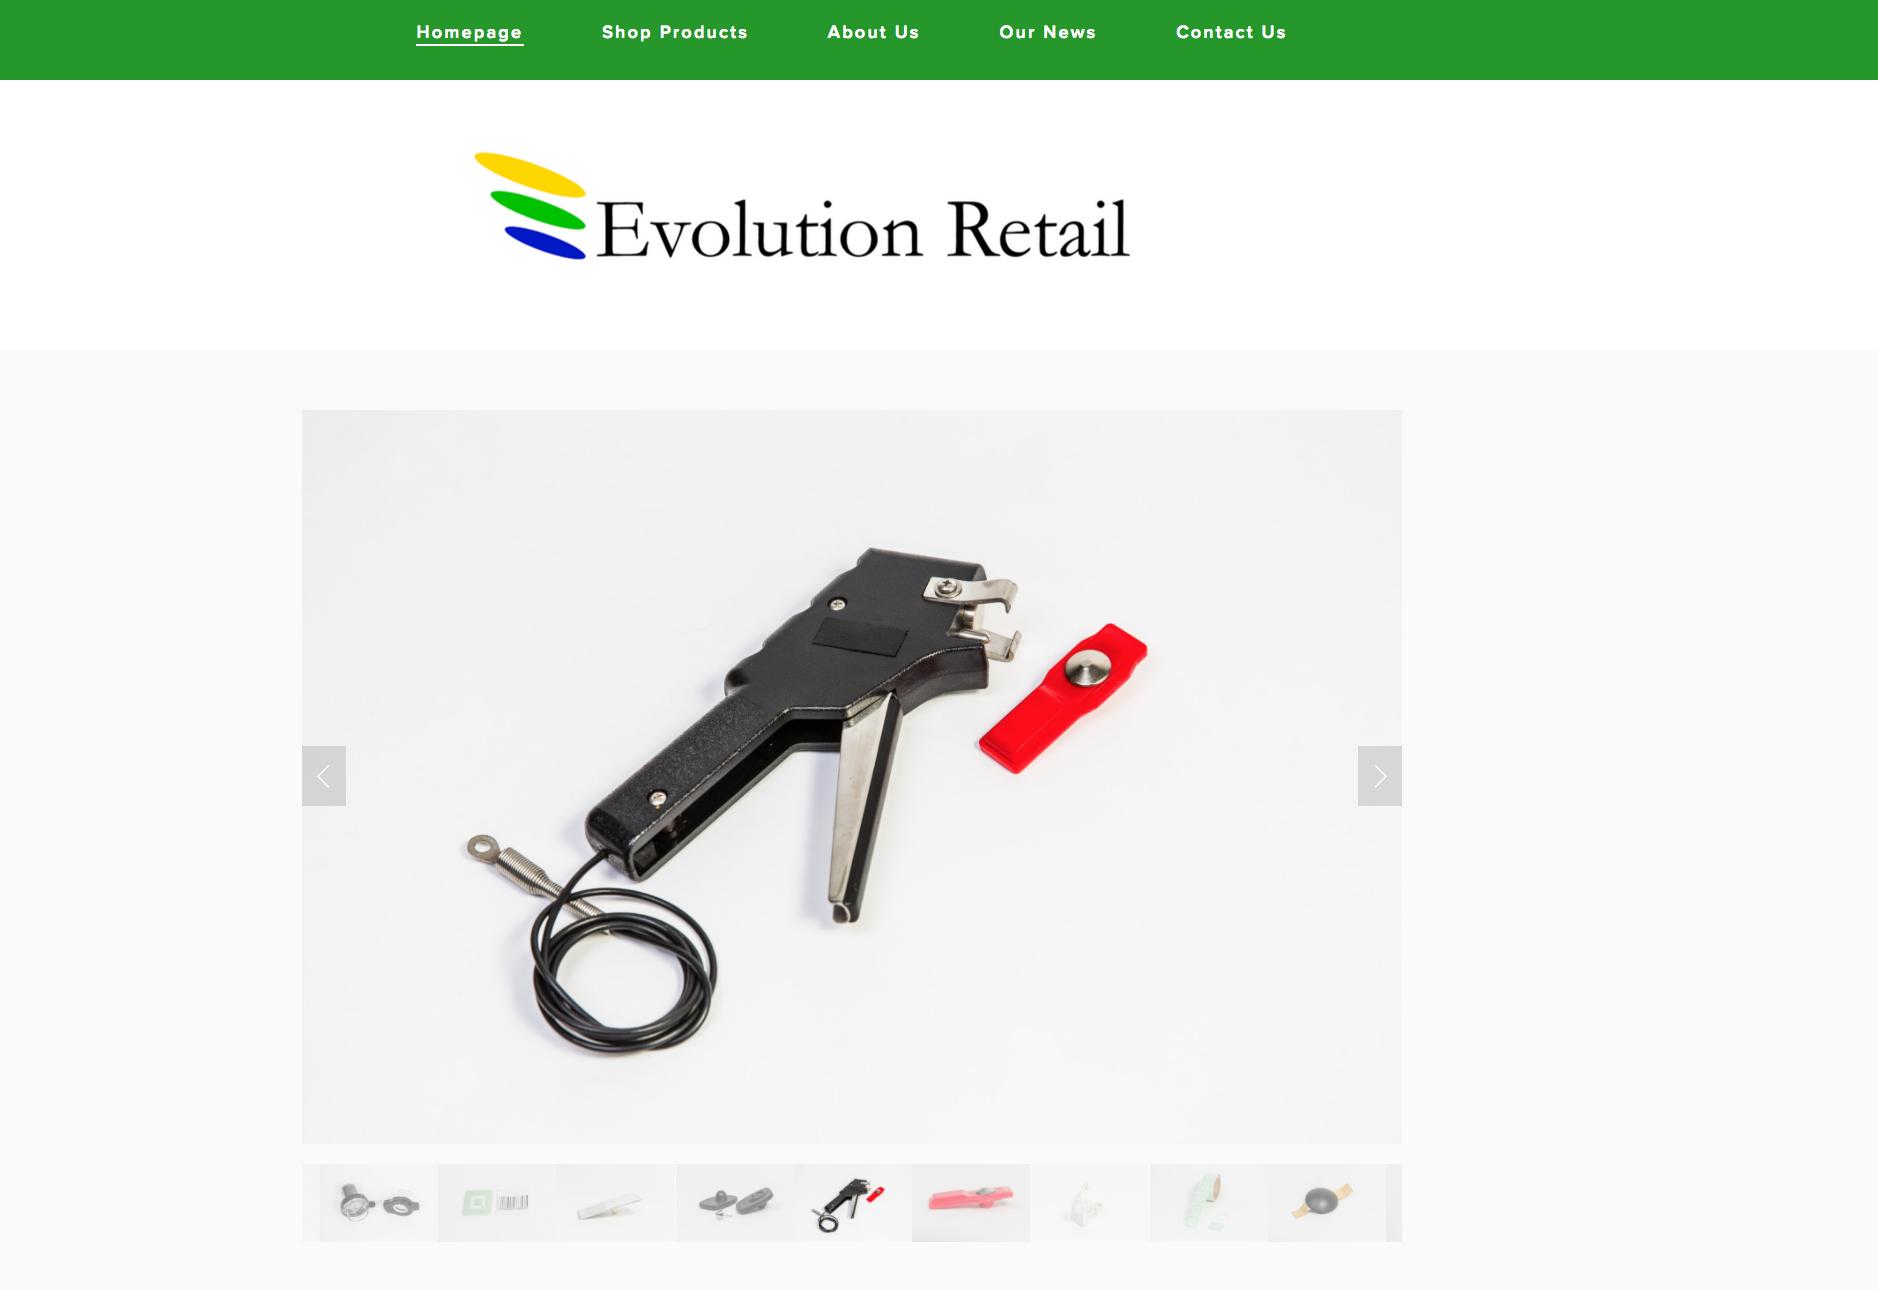 EvolutionRetail